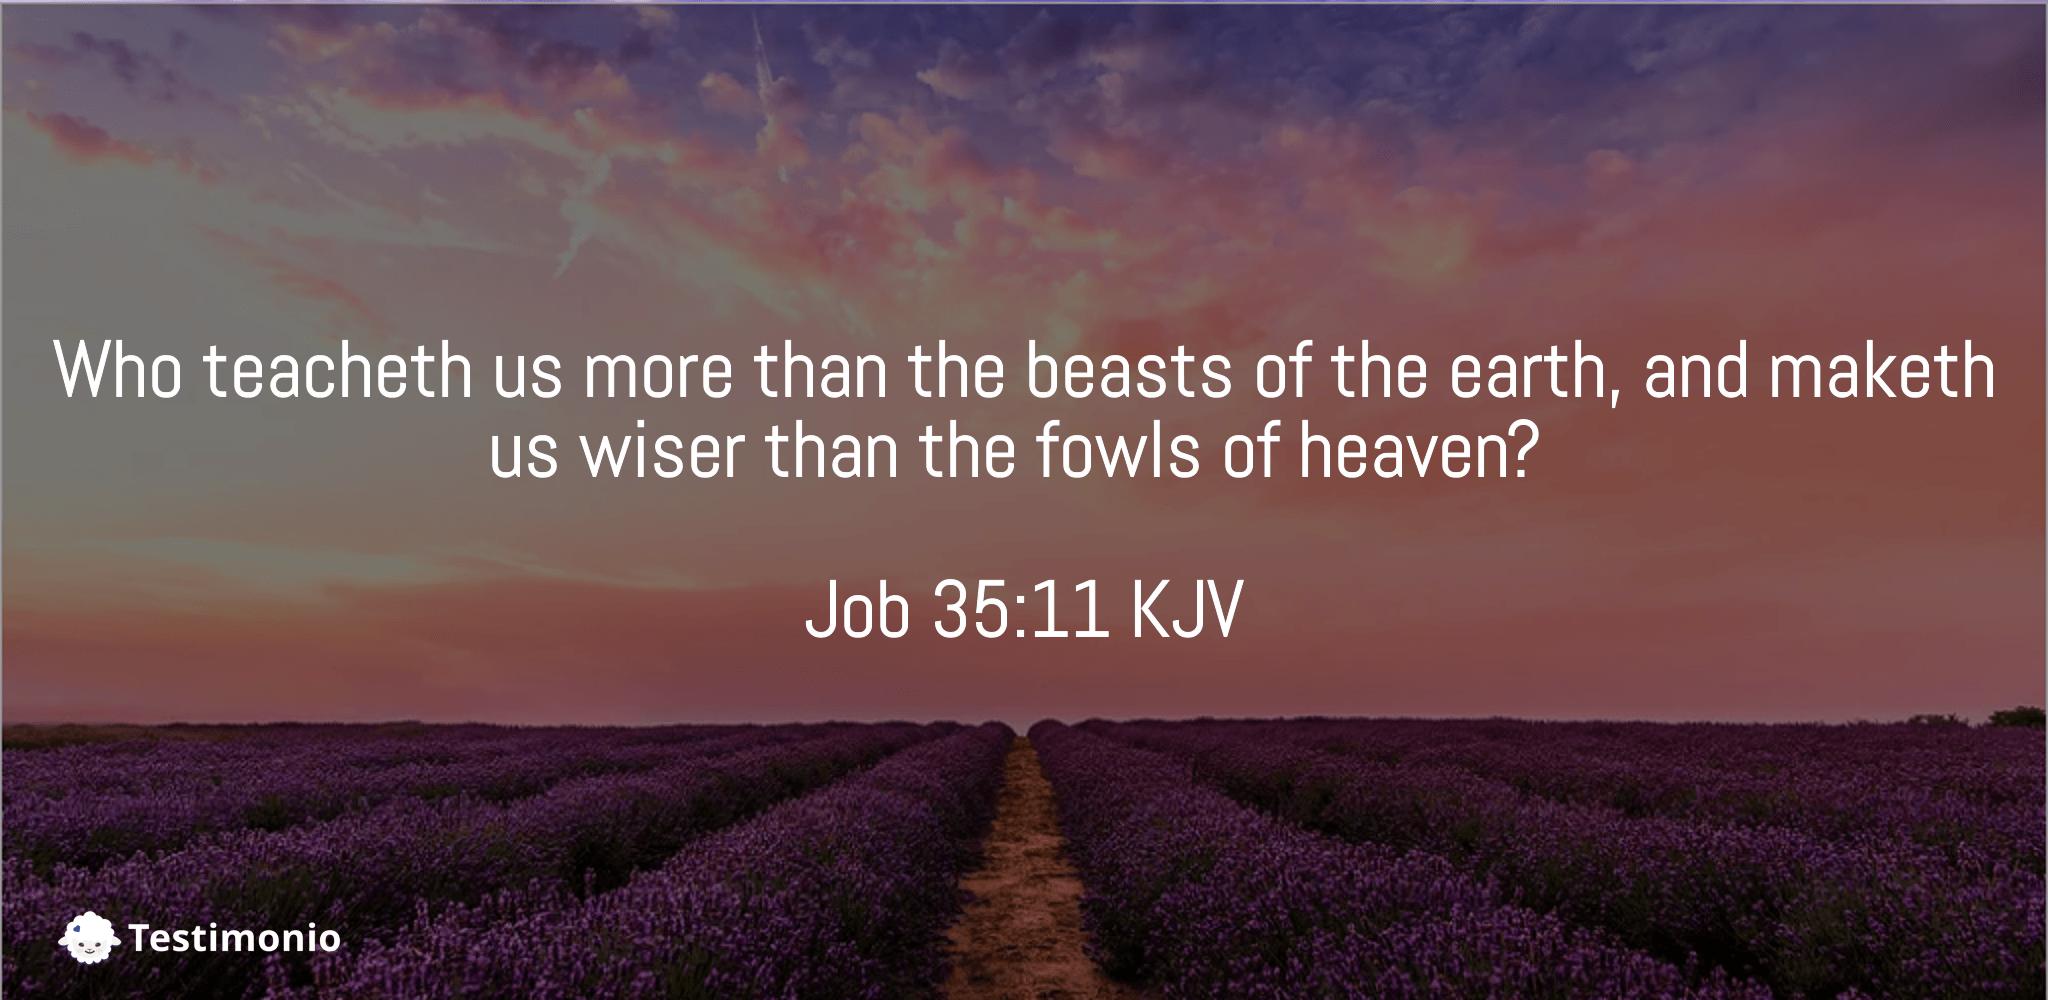 Job 35:11